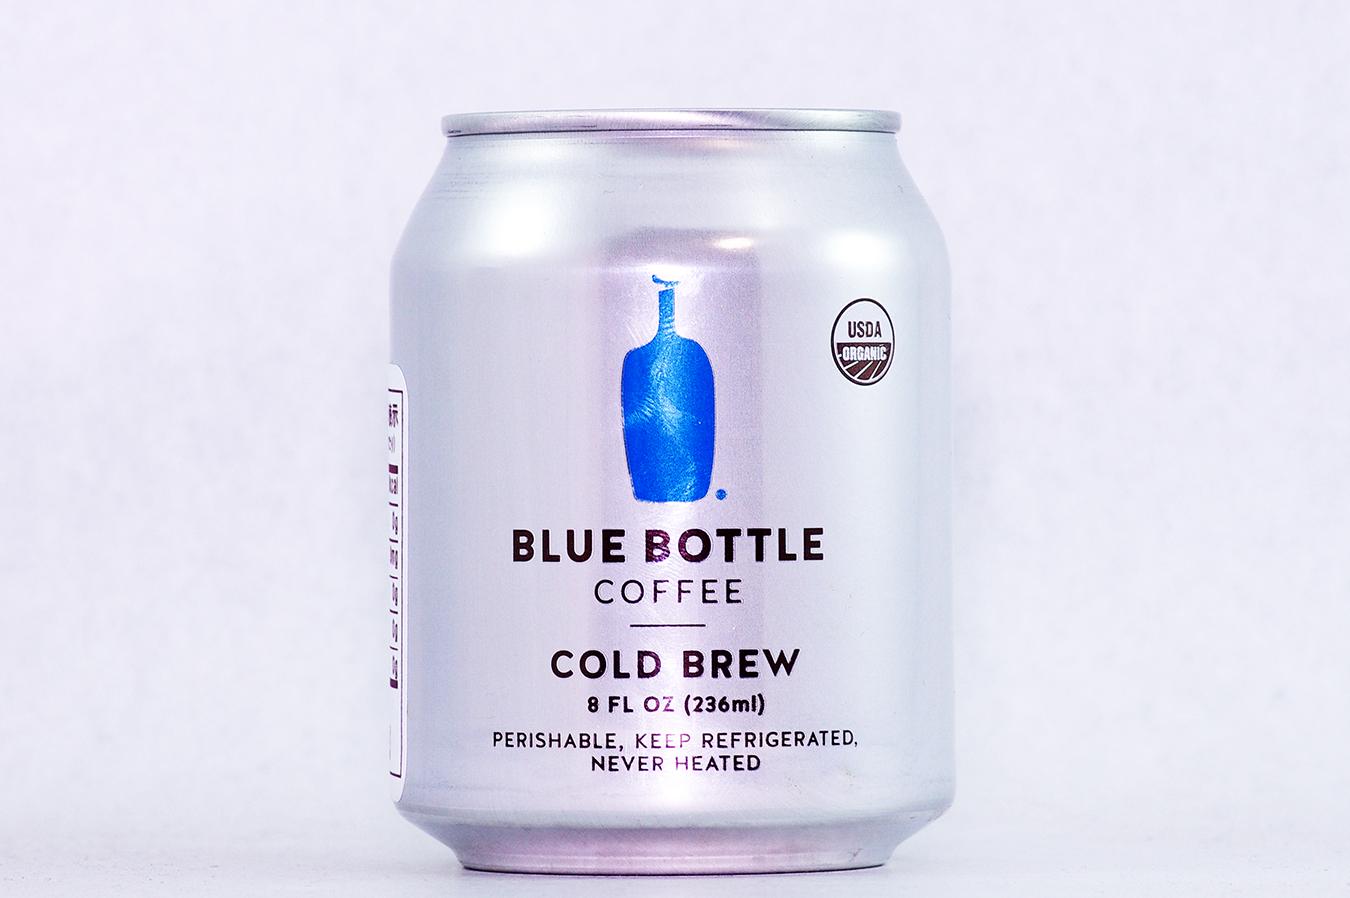 BLUE BOTTLE COFFEE COLD BREW